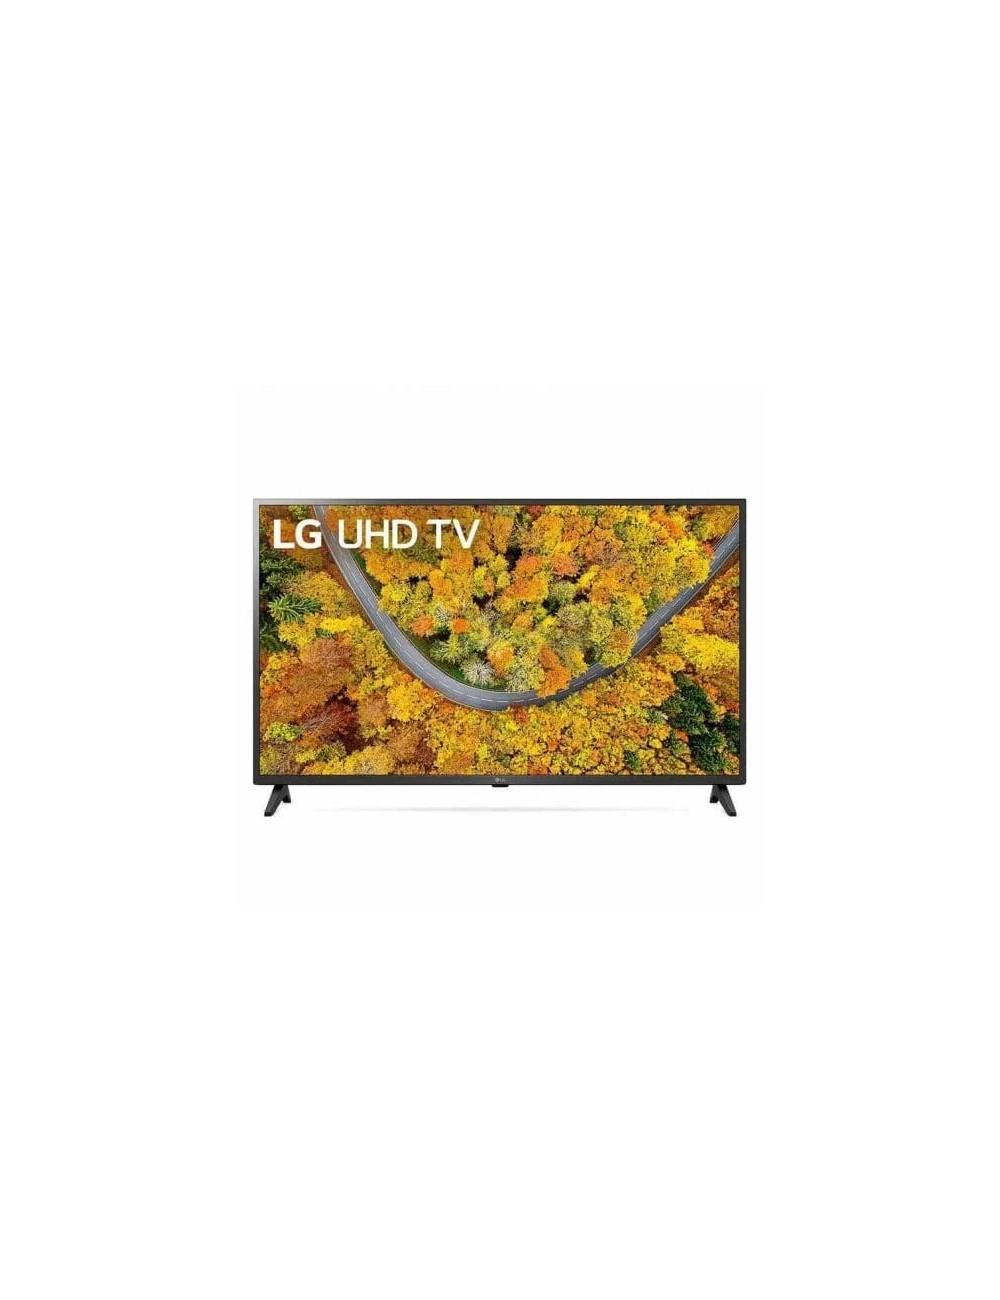 "Televisor LED 43"" LG 43UP75006LF 4K Quad Core Smart TV HDR10 HLG  webOS"